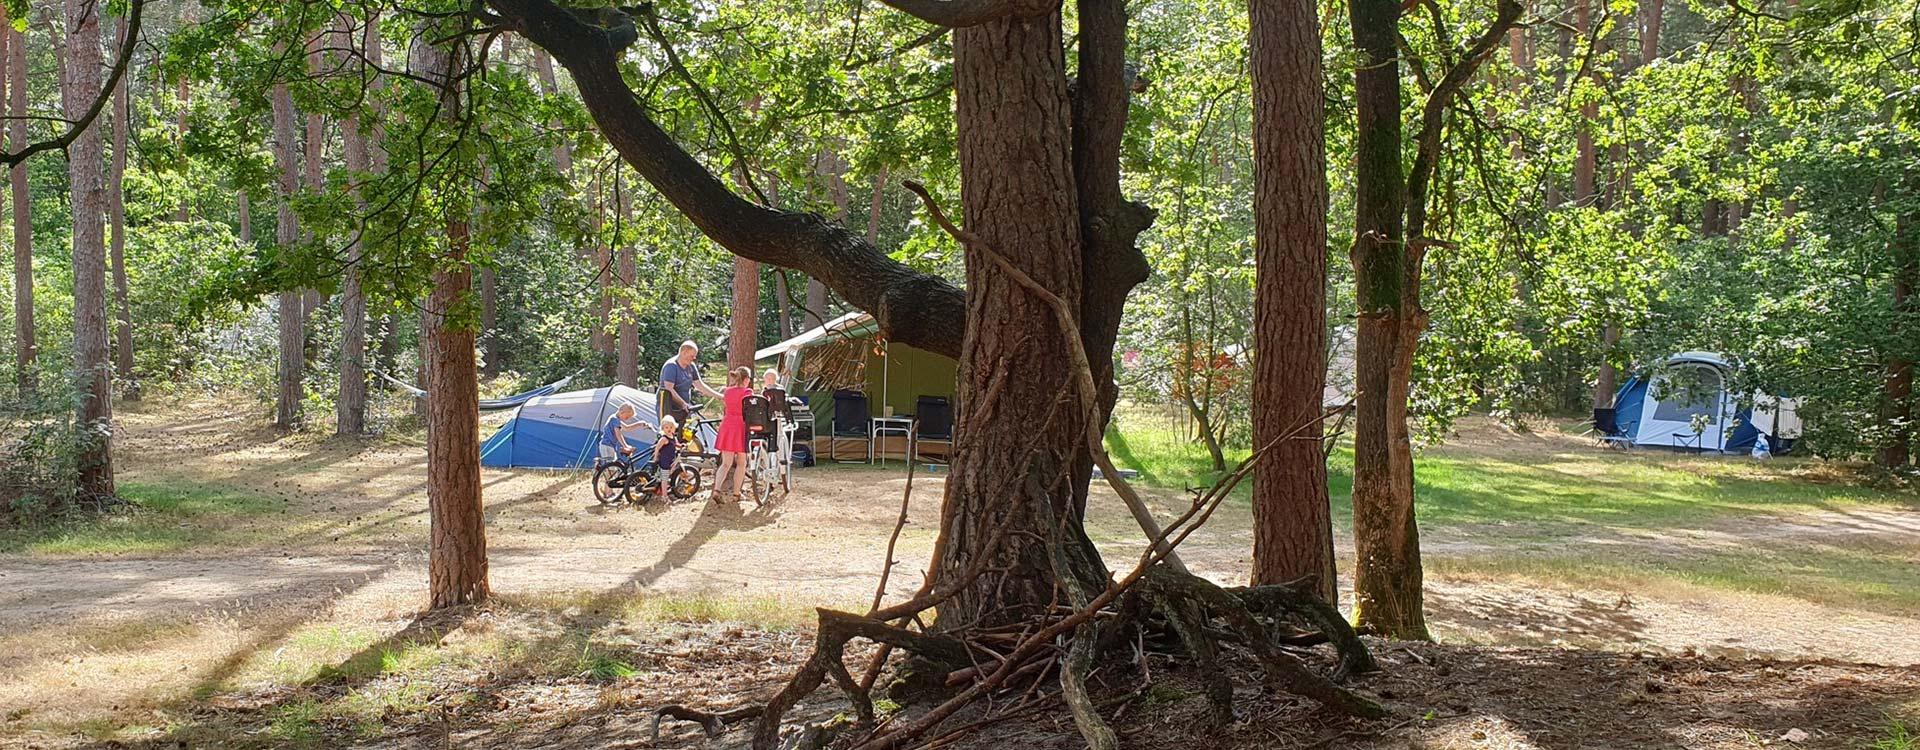 langeloerduinen-boscamping-in-drenthe